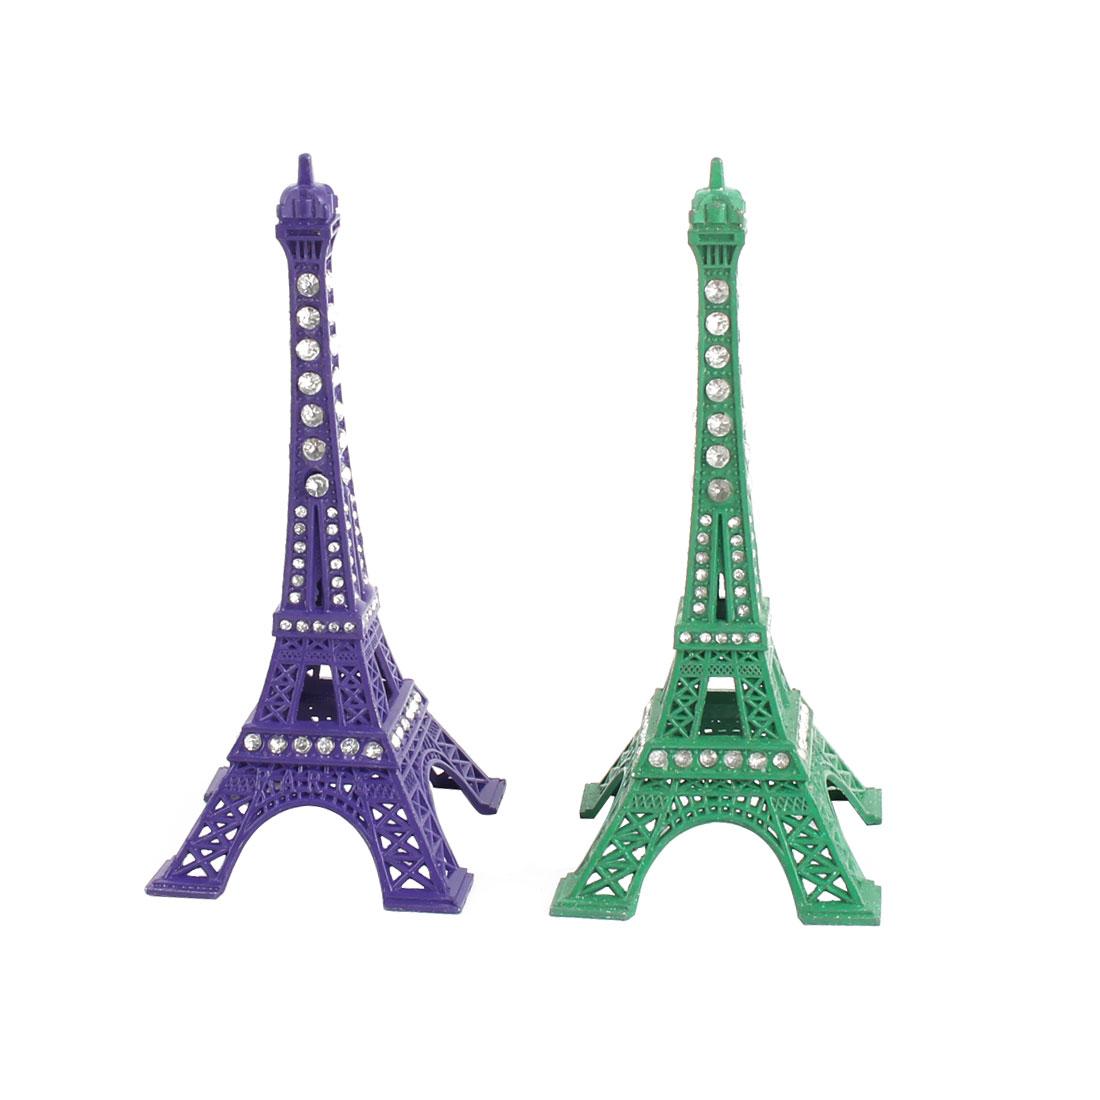 Room Bedroom Metal Miniature Statue Eiffel Tower Model Souvenir Ornament Green Purple 2pcs